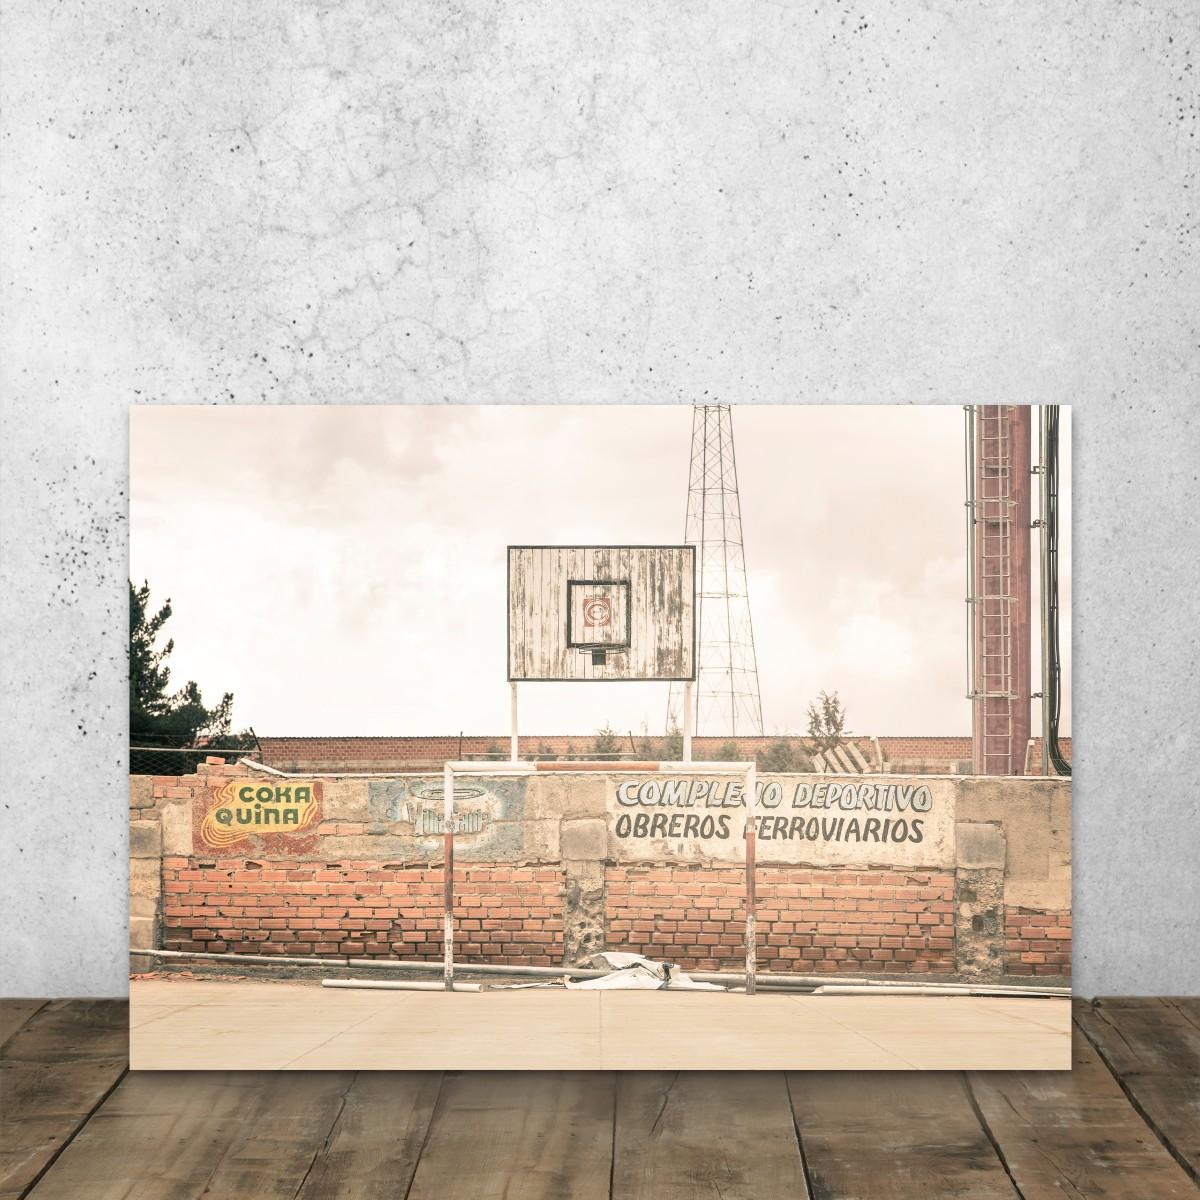 JOE MANIA / Modern Artprint Poster / Streetball Courts 1 (La Paz, Bolivia) DIN A4 - A0